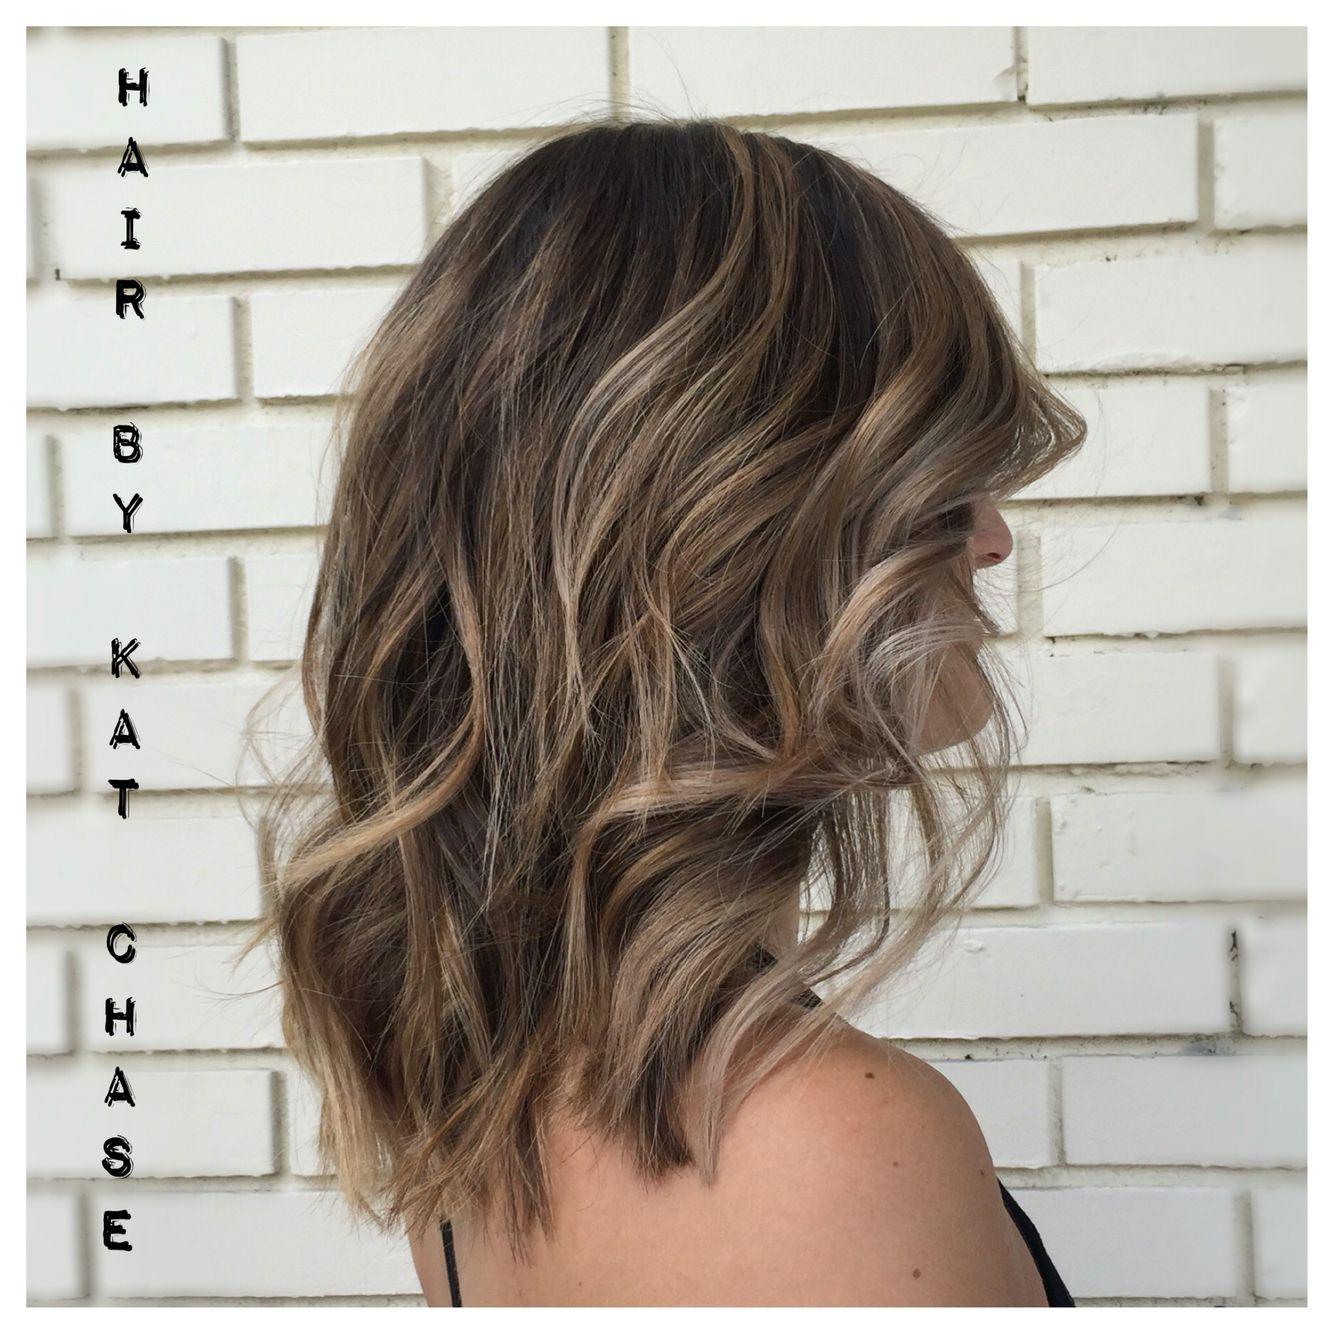 Shoulder Length Dark Brown Hair With Blonde Highlights Makeupsite